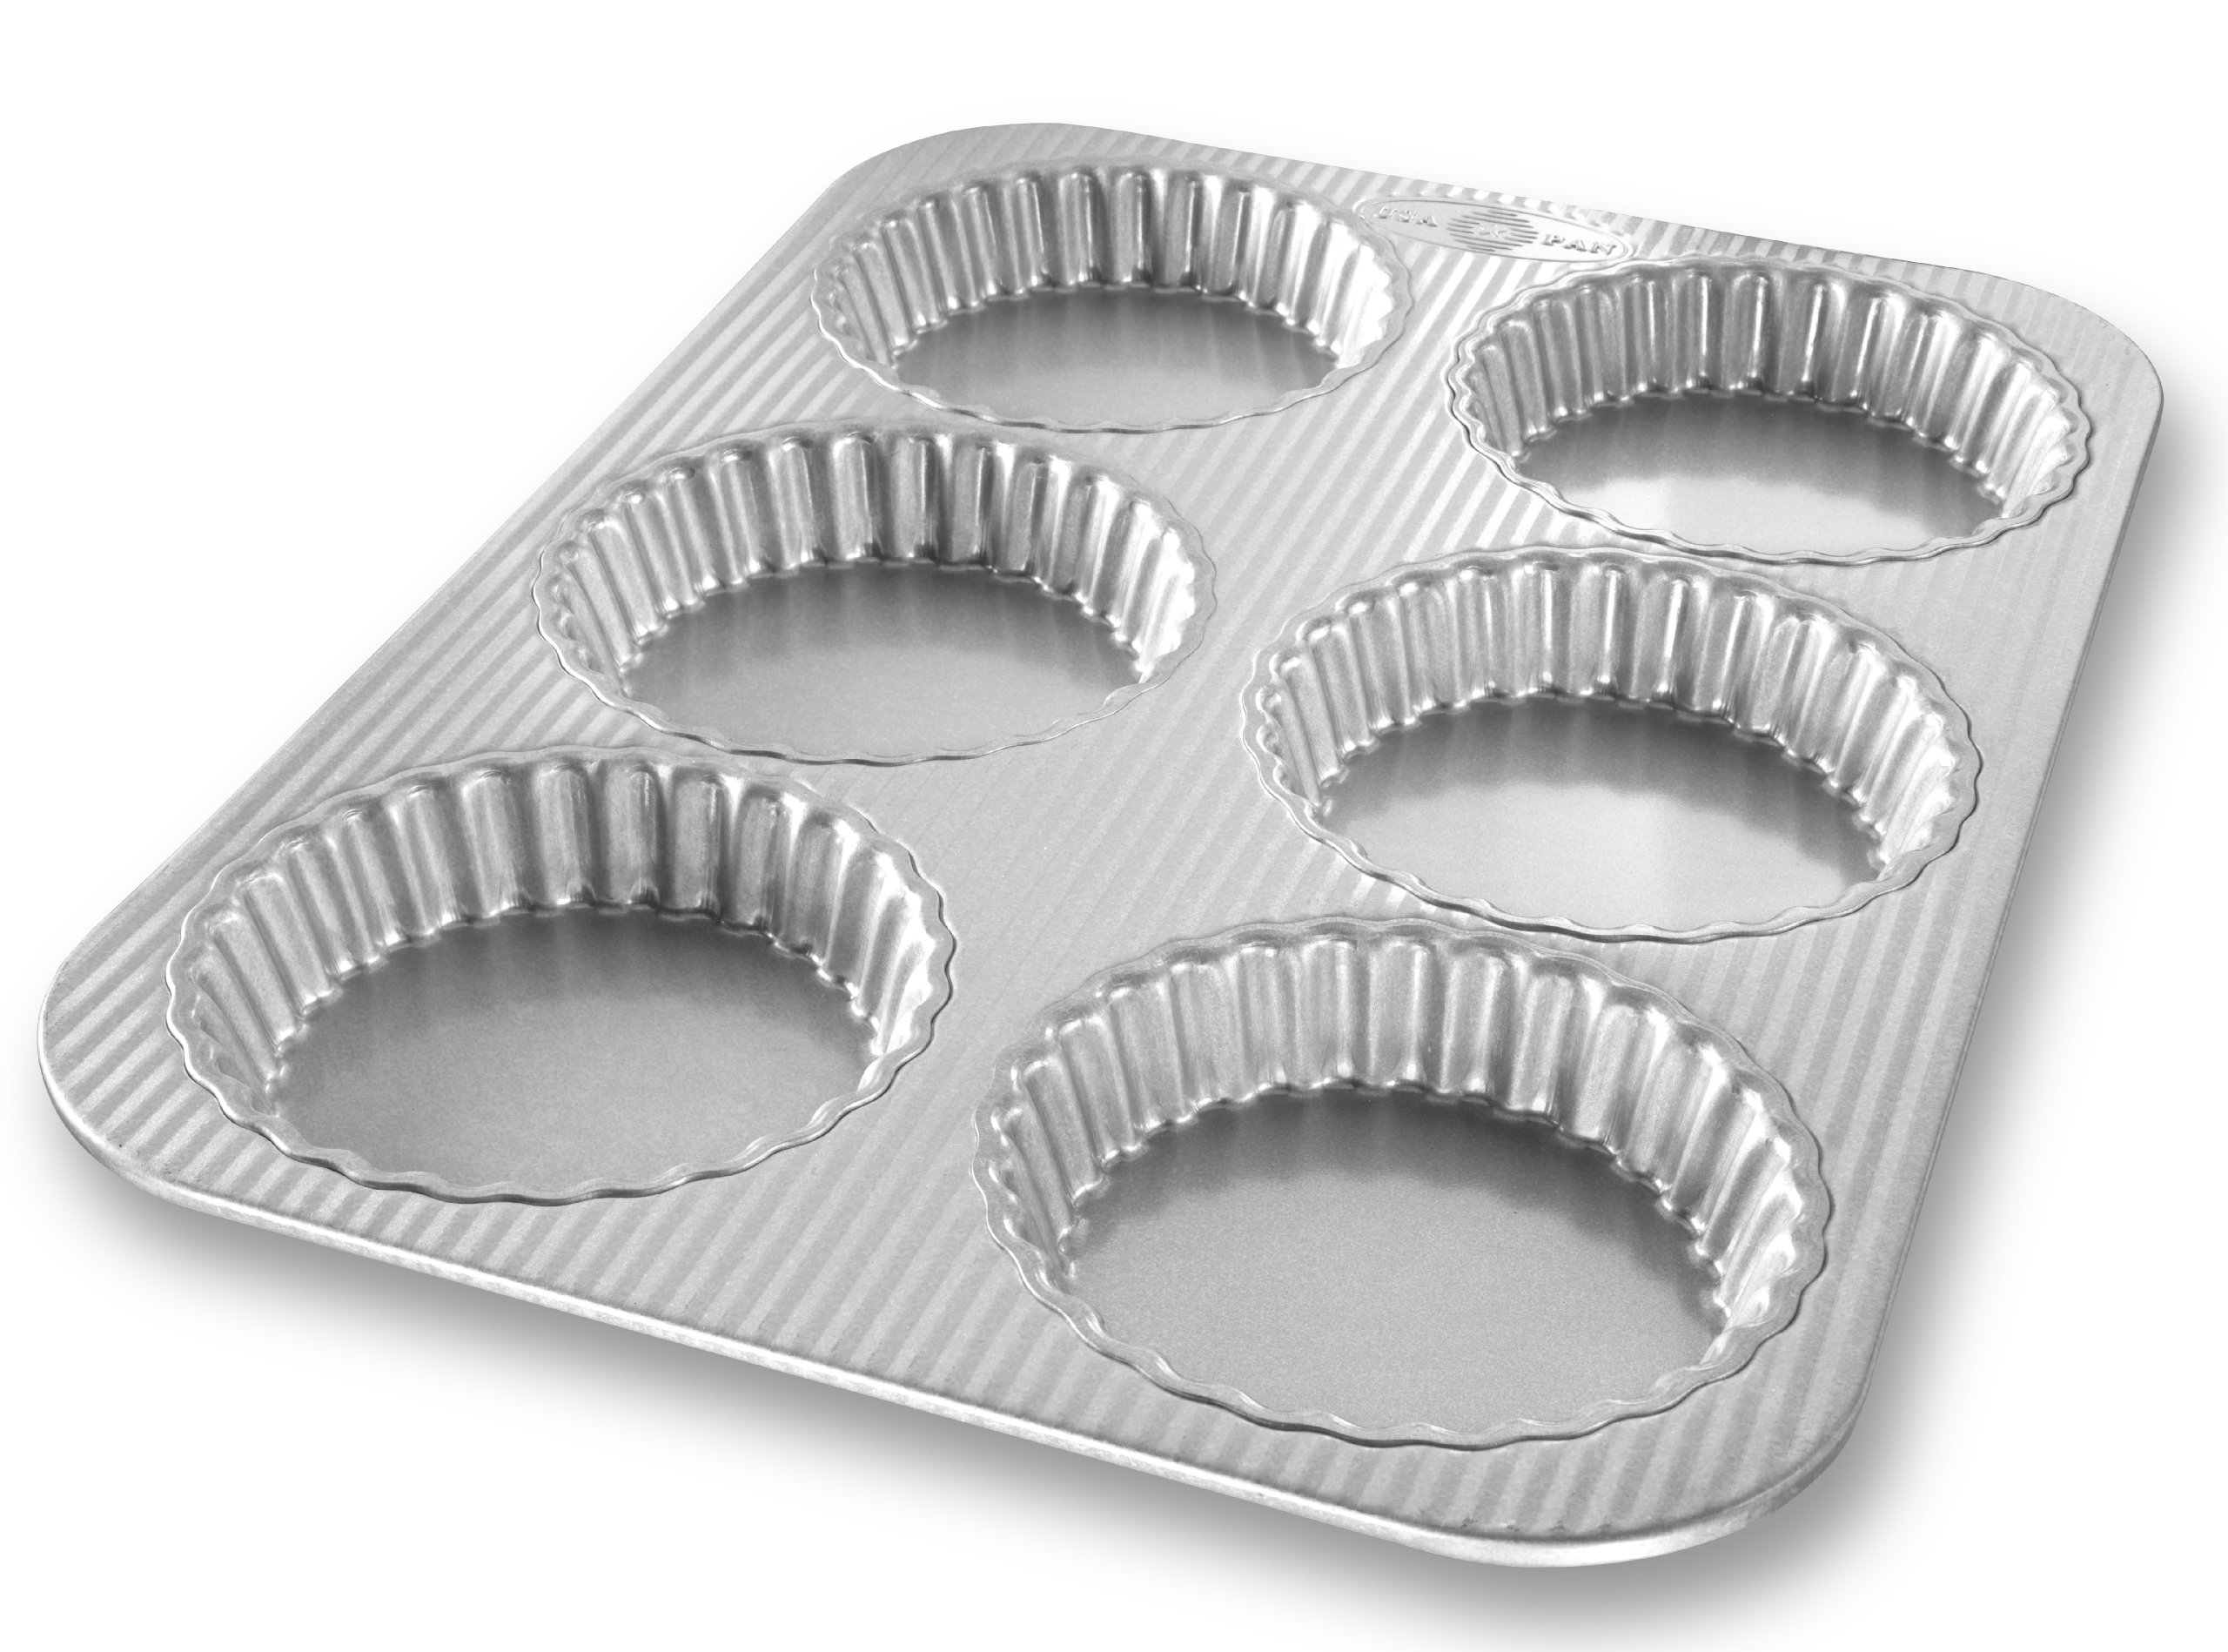 USA Pan Bakeware Aluminized Steel Mini Fluted Tart Pan, 6-Well by USA Pan